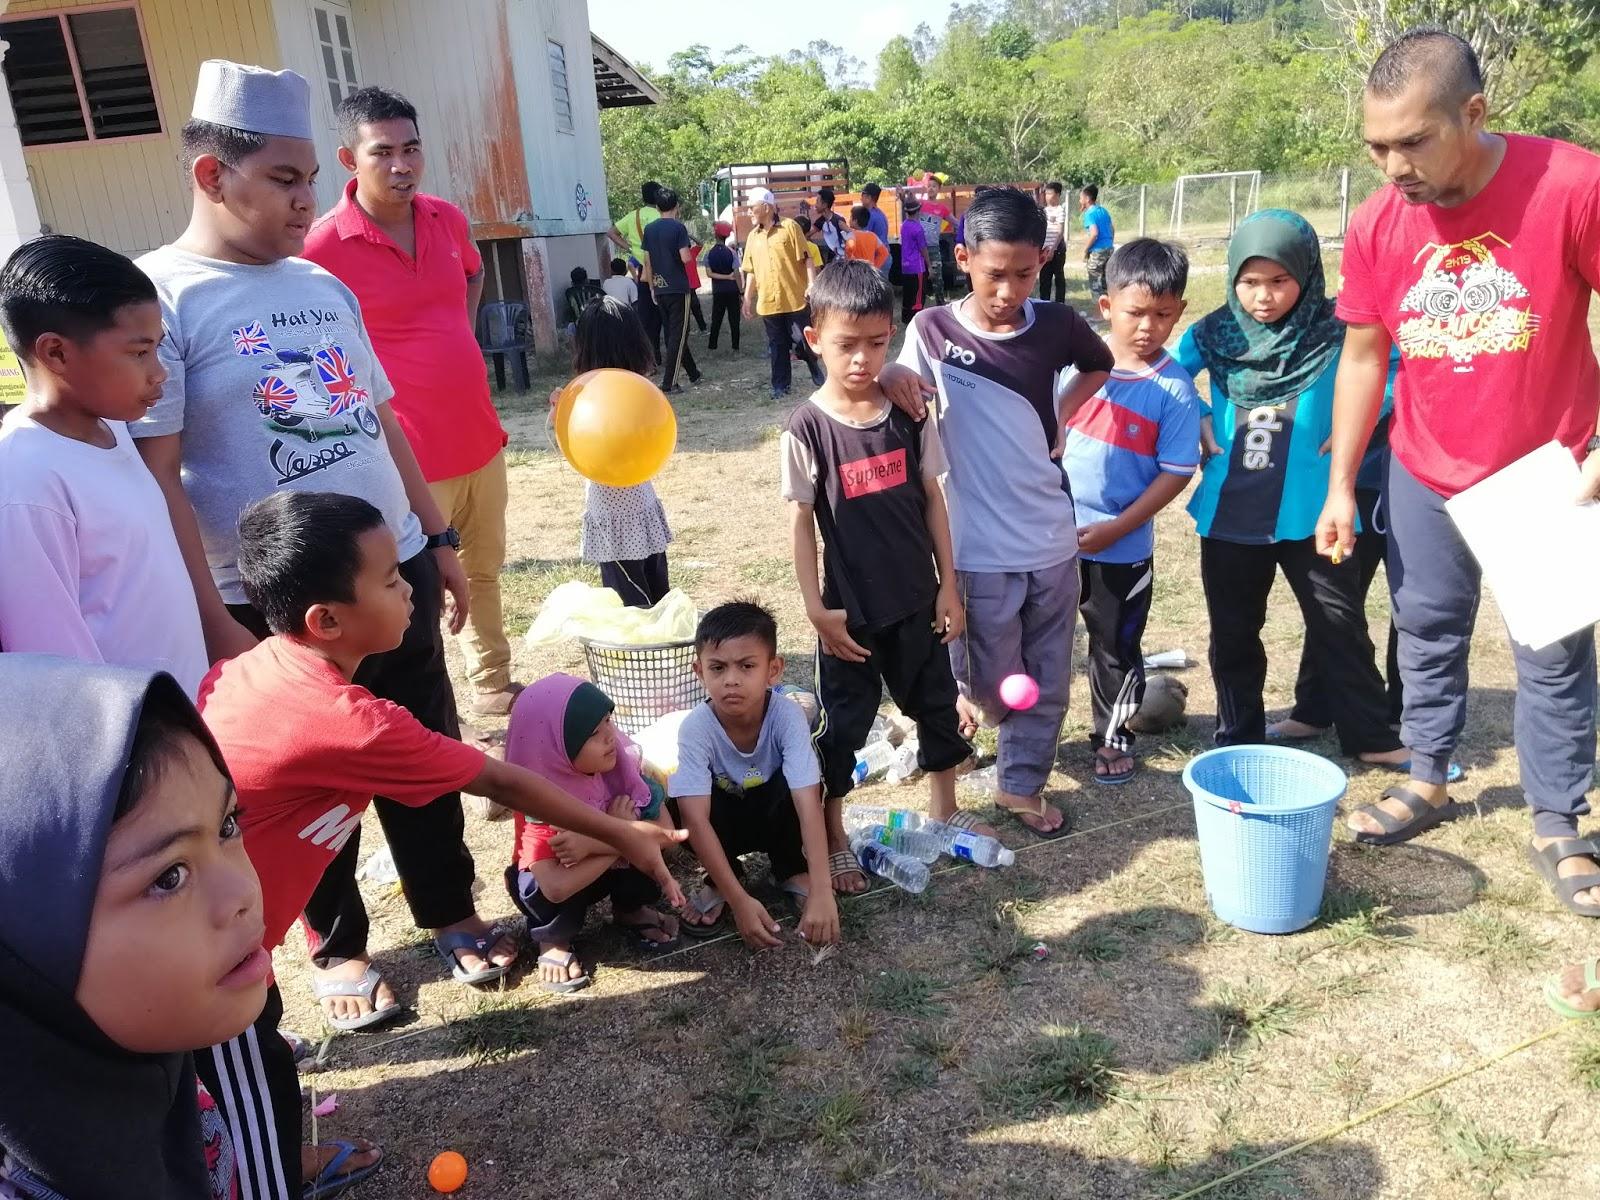 Program YB Bersama Rakyat Eratkan Hubungan Masyarakat